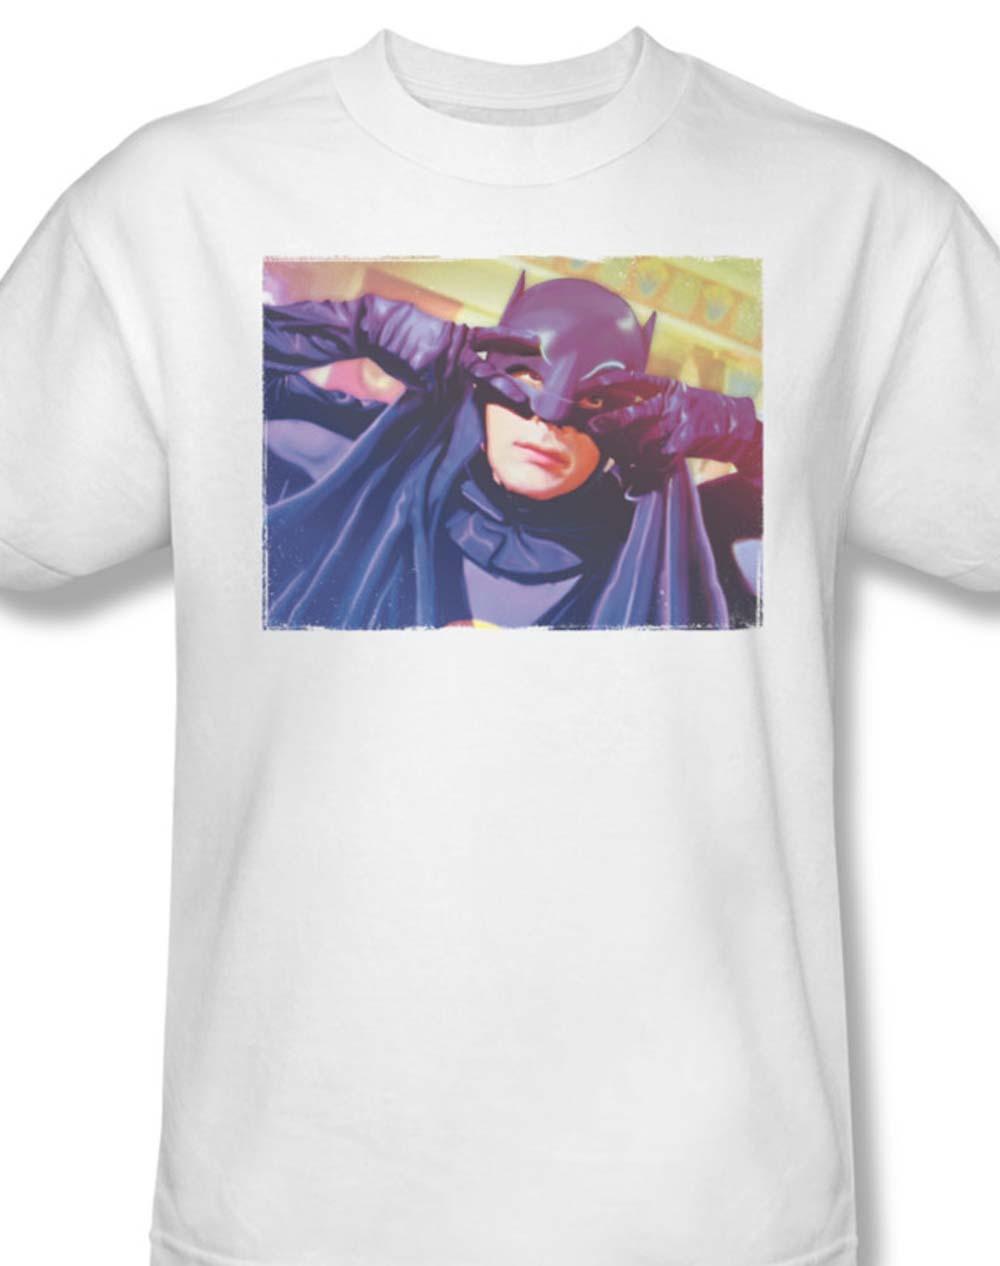 Bmt123 at batman dc comics batusi white  tshirt